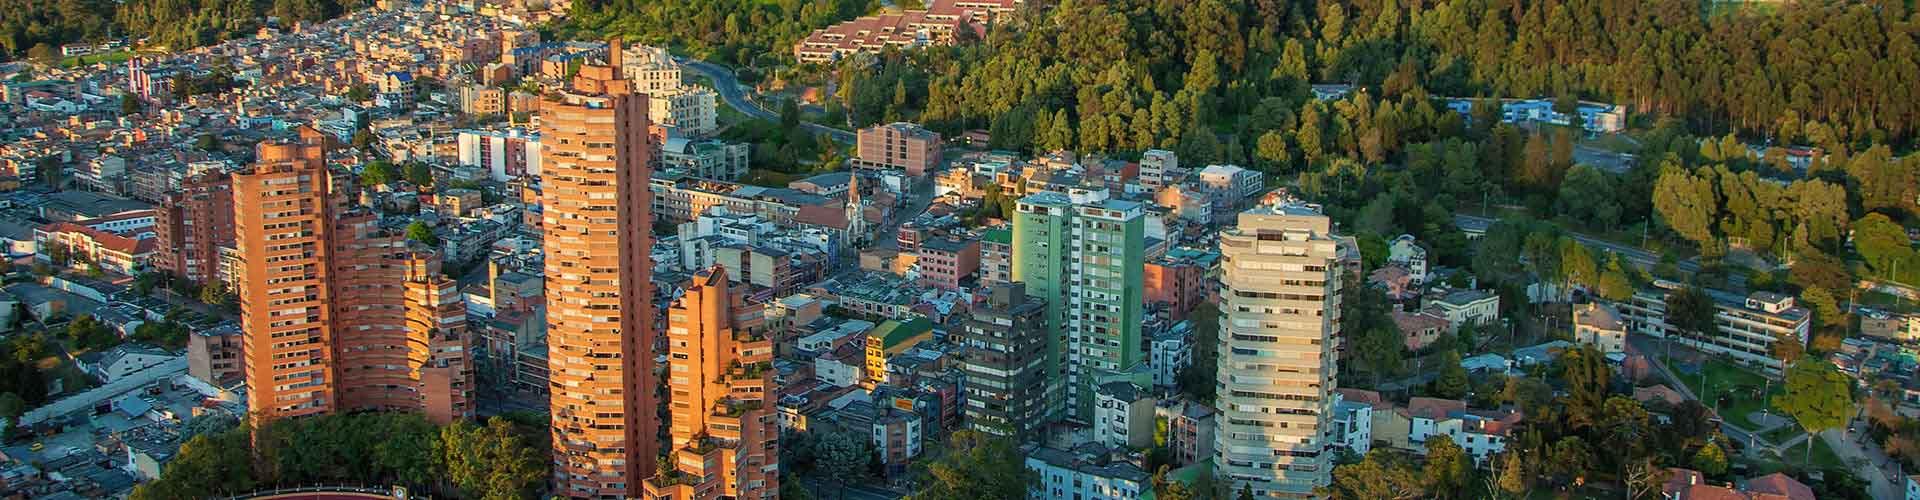 Bogotá - Hostales en Bogotá. Mapas de Bogotá, Fotos y comentarios de cada Hostal en Bogotá.